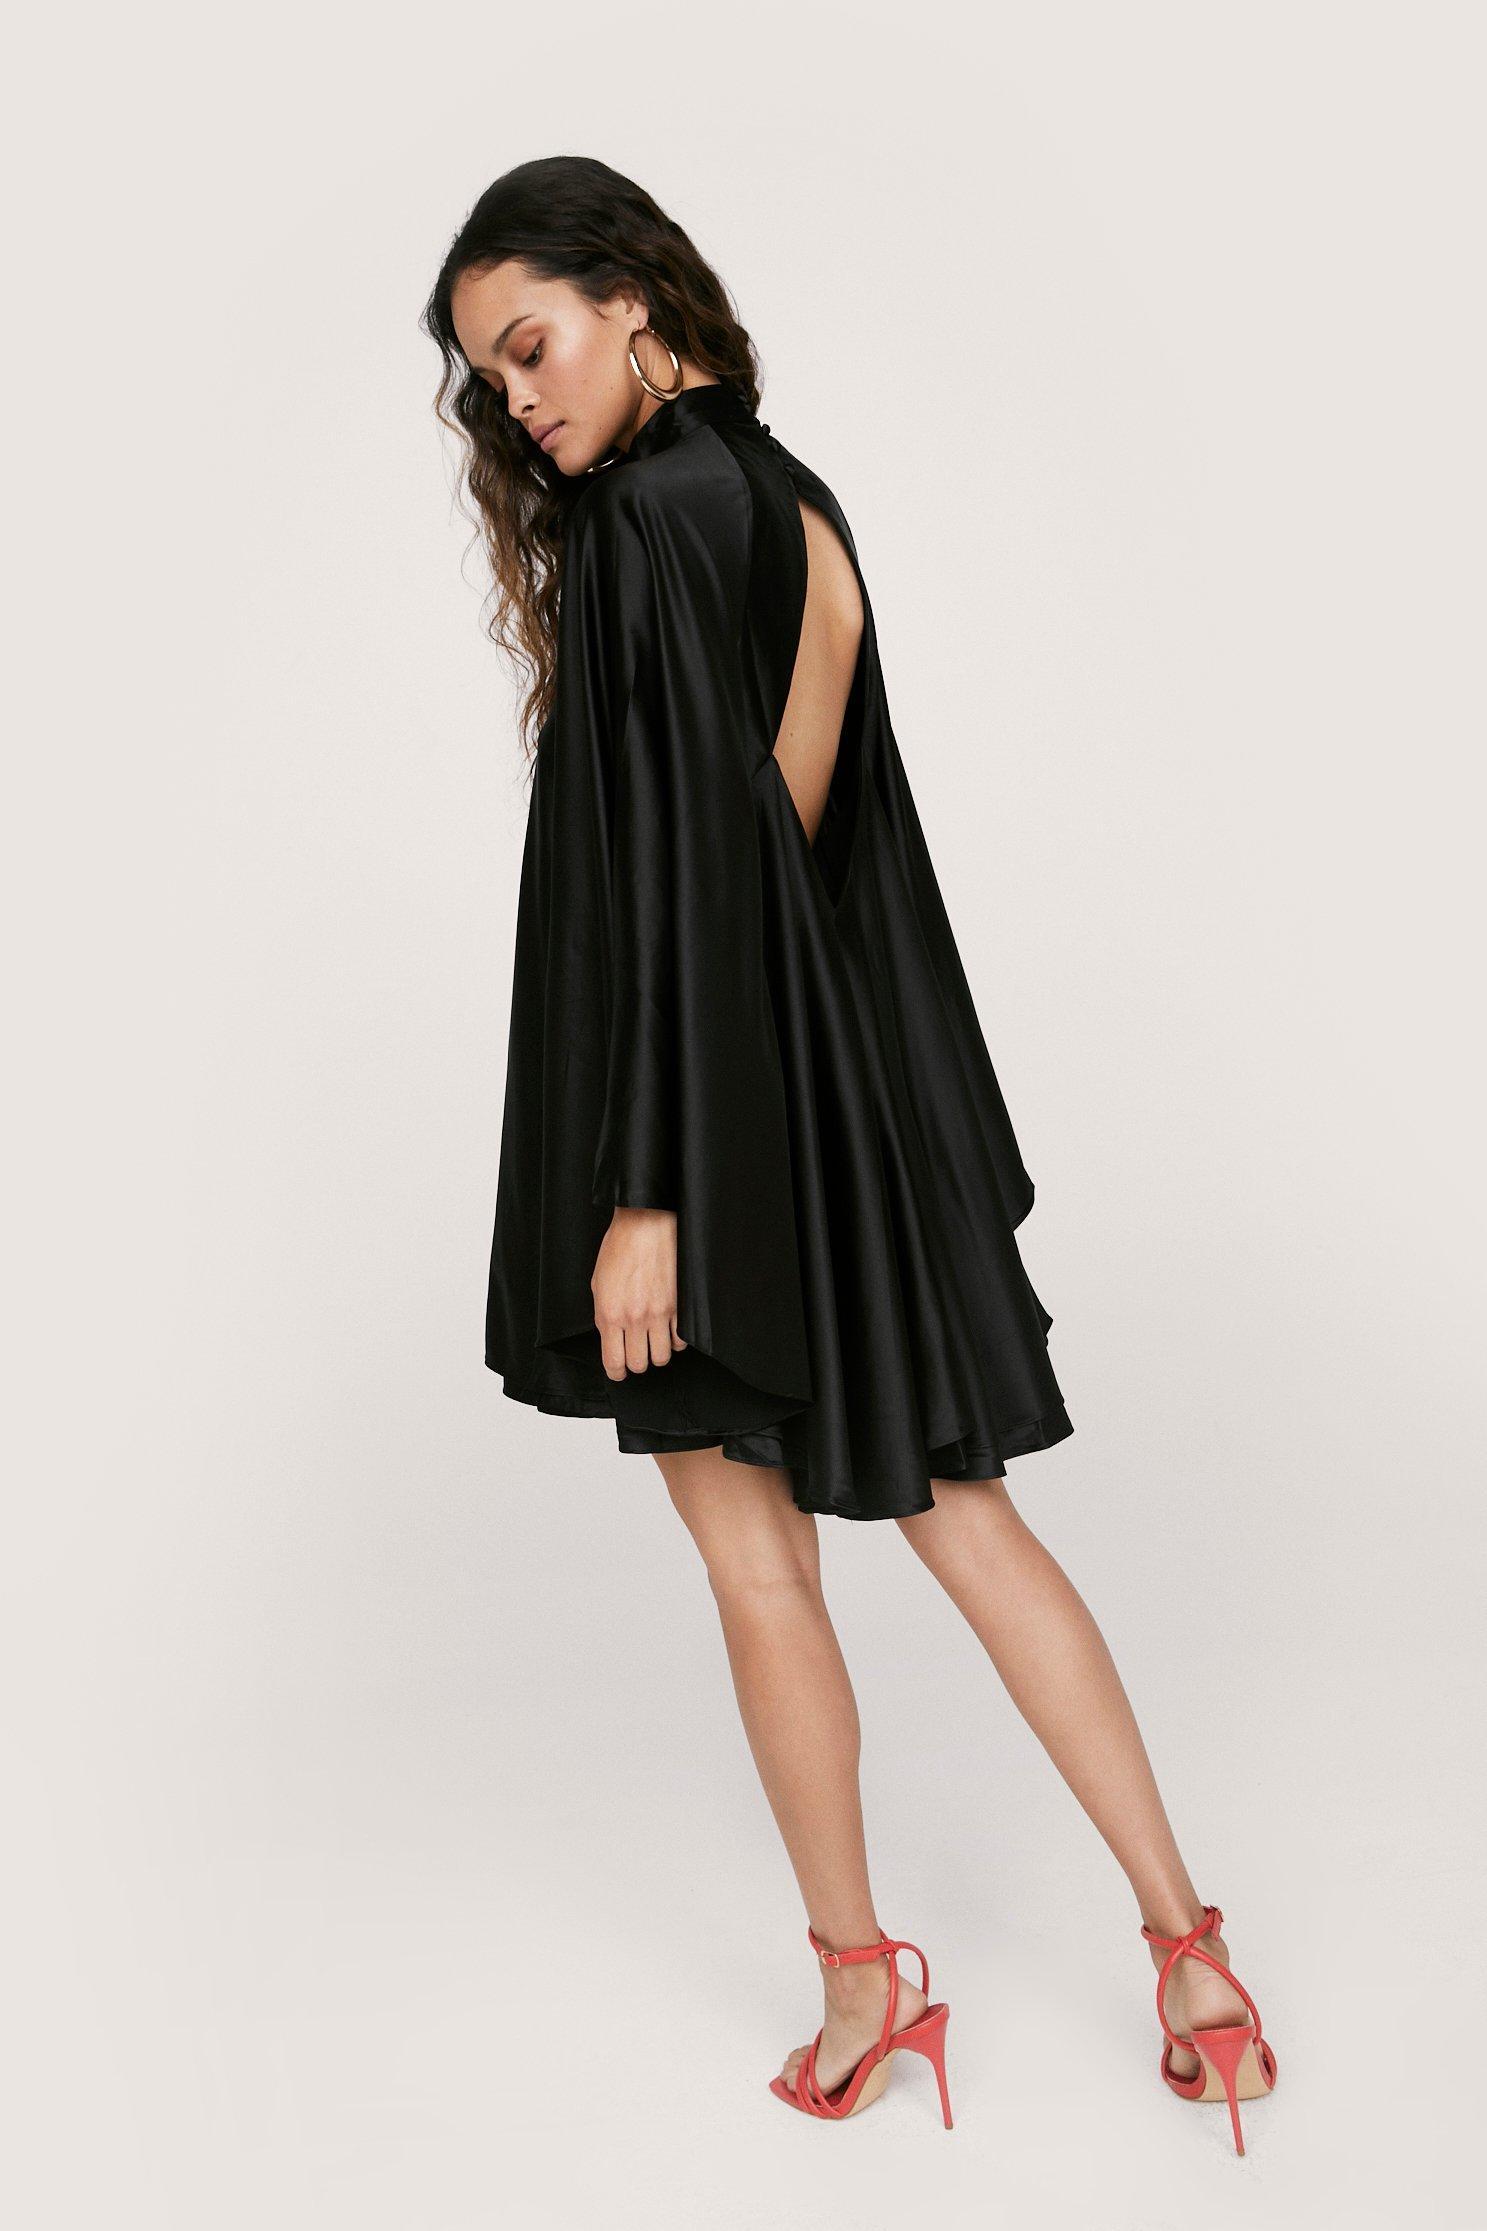 70s Prom, Formal, Evening, Party Dresses Womens Open Back High Neck Satin Dress - Black - XS $34.00 AT vintagedancer.com